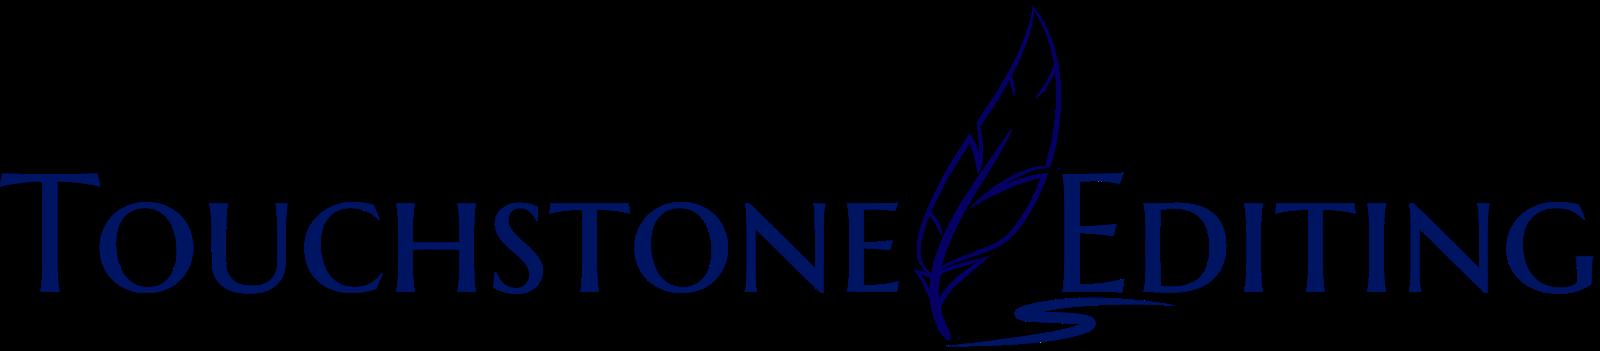 Touchstone Editing logo